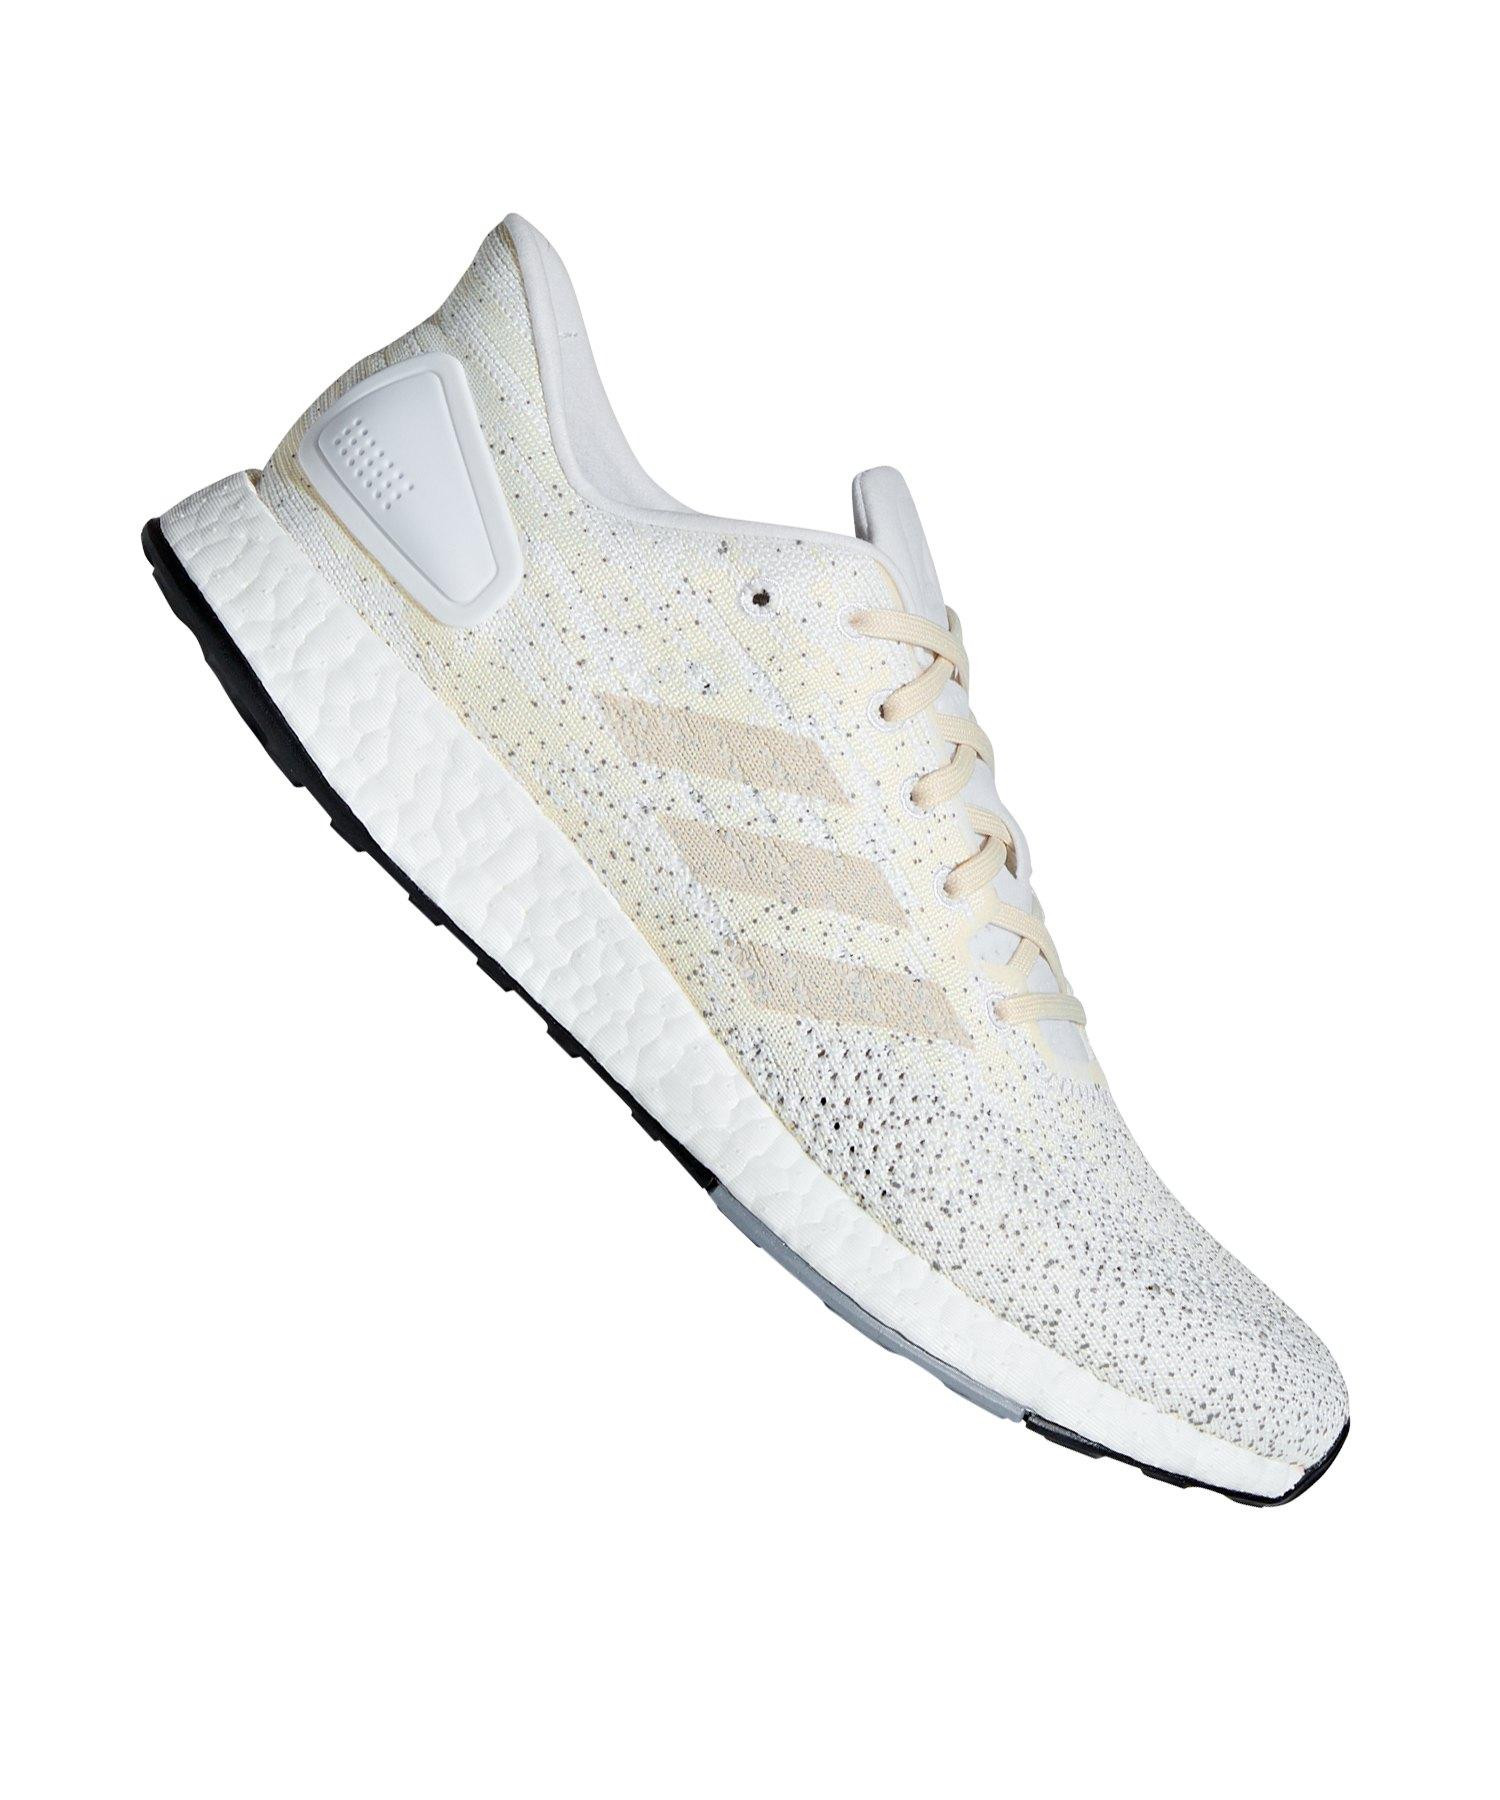 Sale Herren 2017 UA Adidas Pure Boost DPR BA8893 Weiß Schuhe